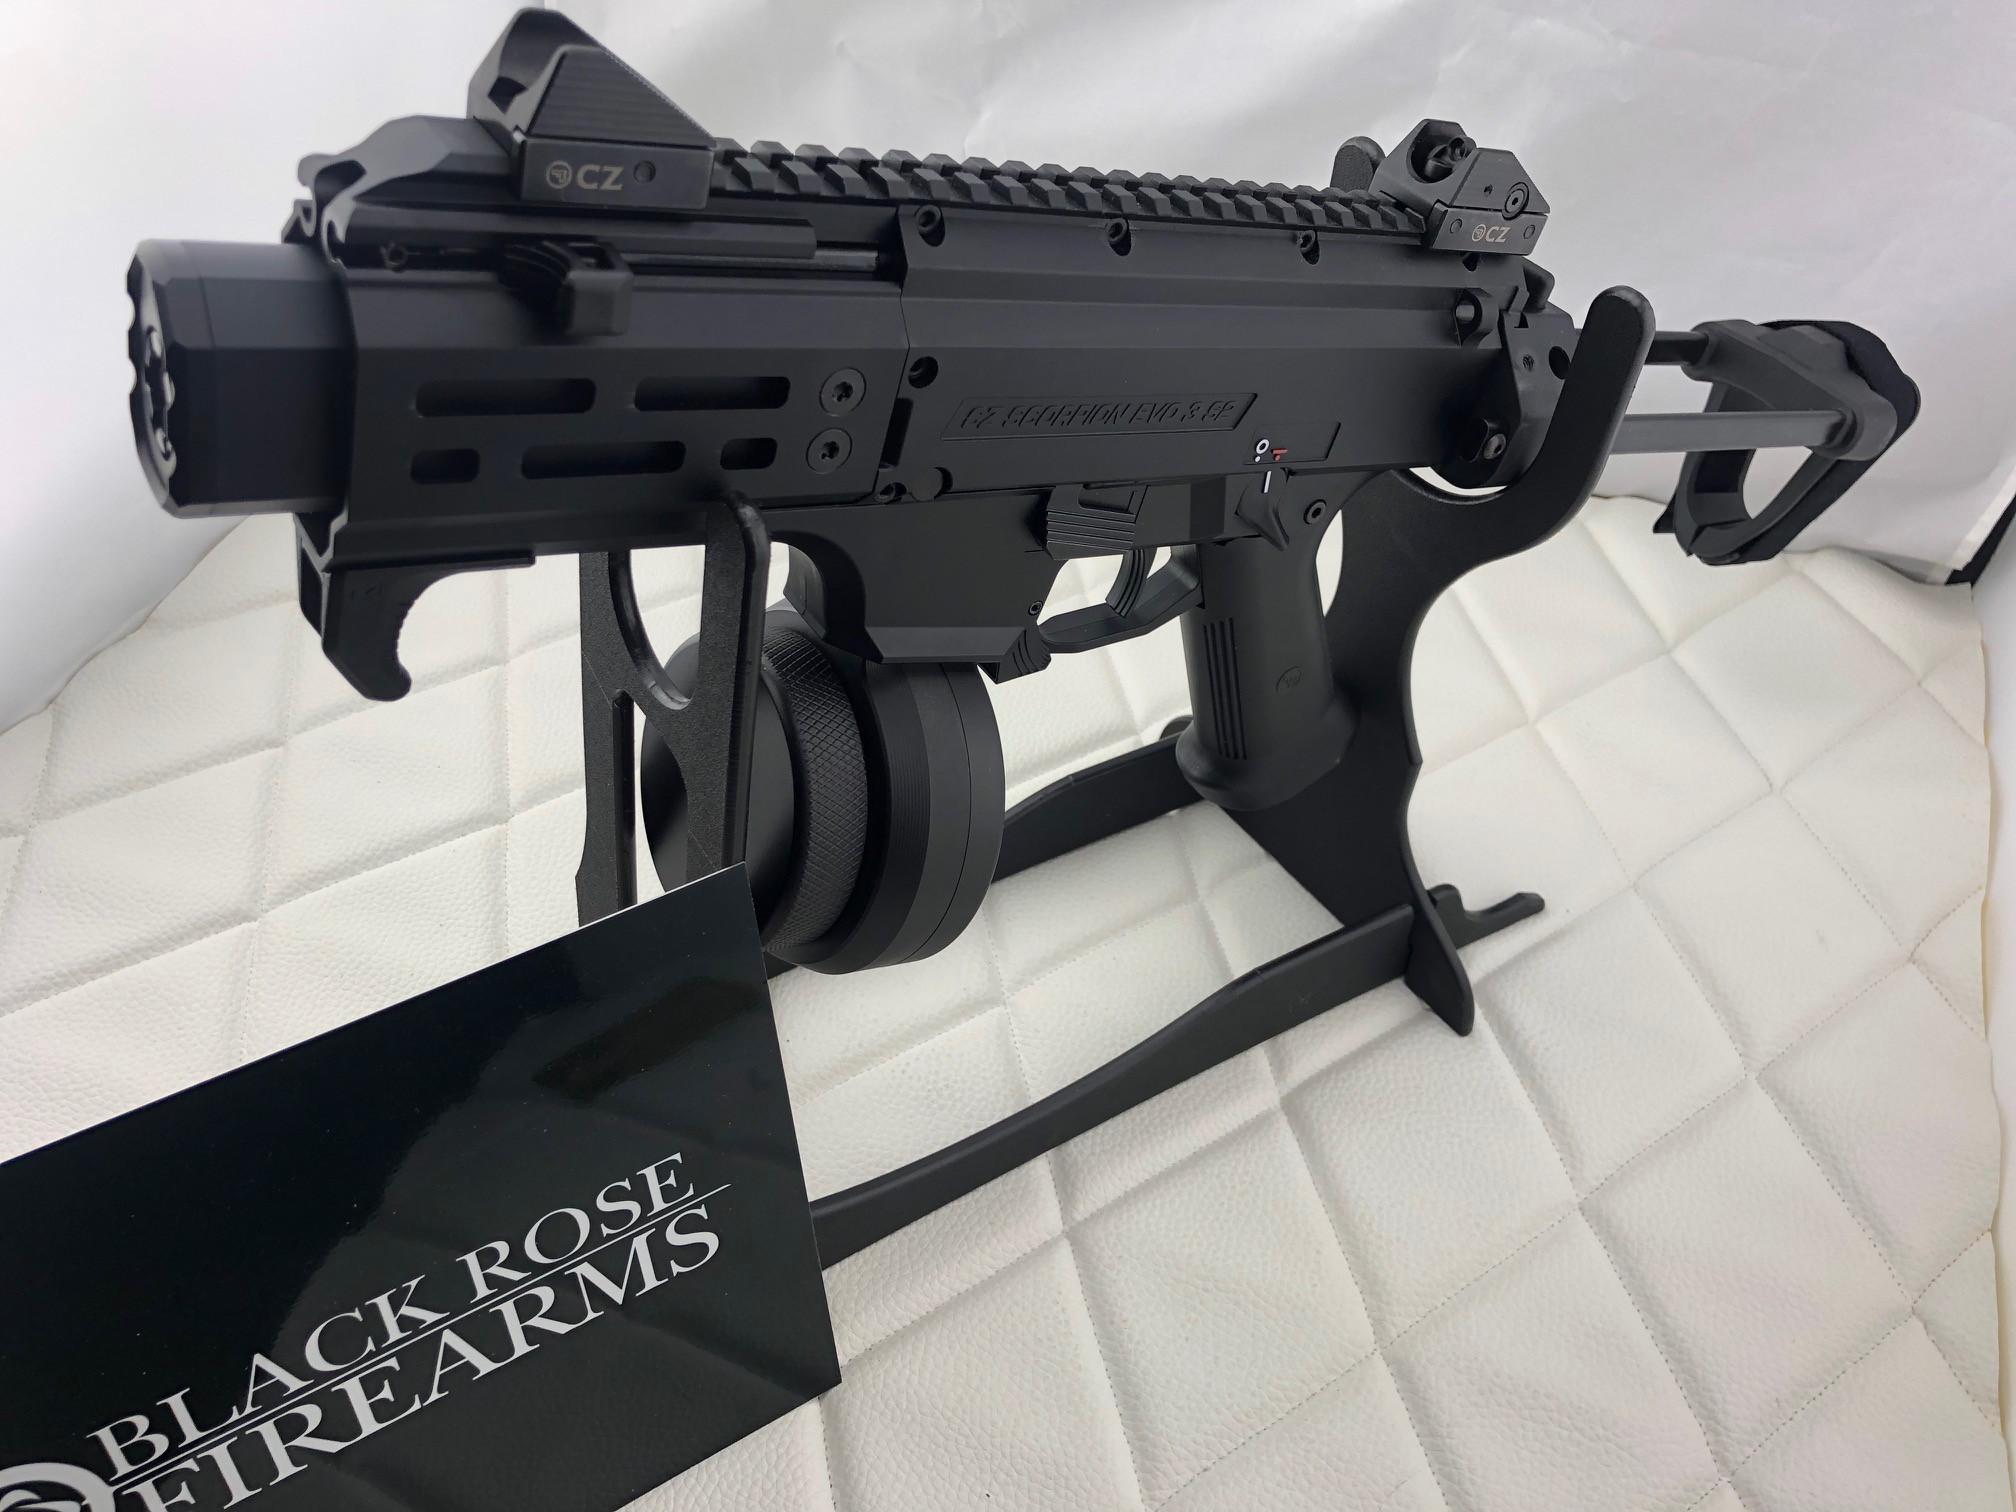 Black Rose Firearms| CZ SCORPION MICRO 9MM WITH ARM BRACE